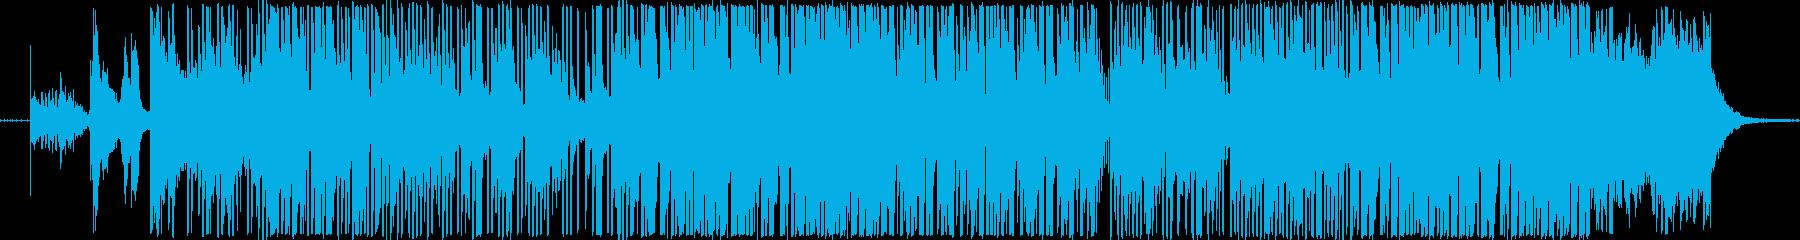 EDMでフェスのような曲の再生済みの波形